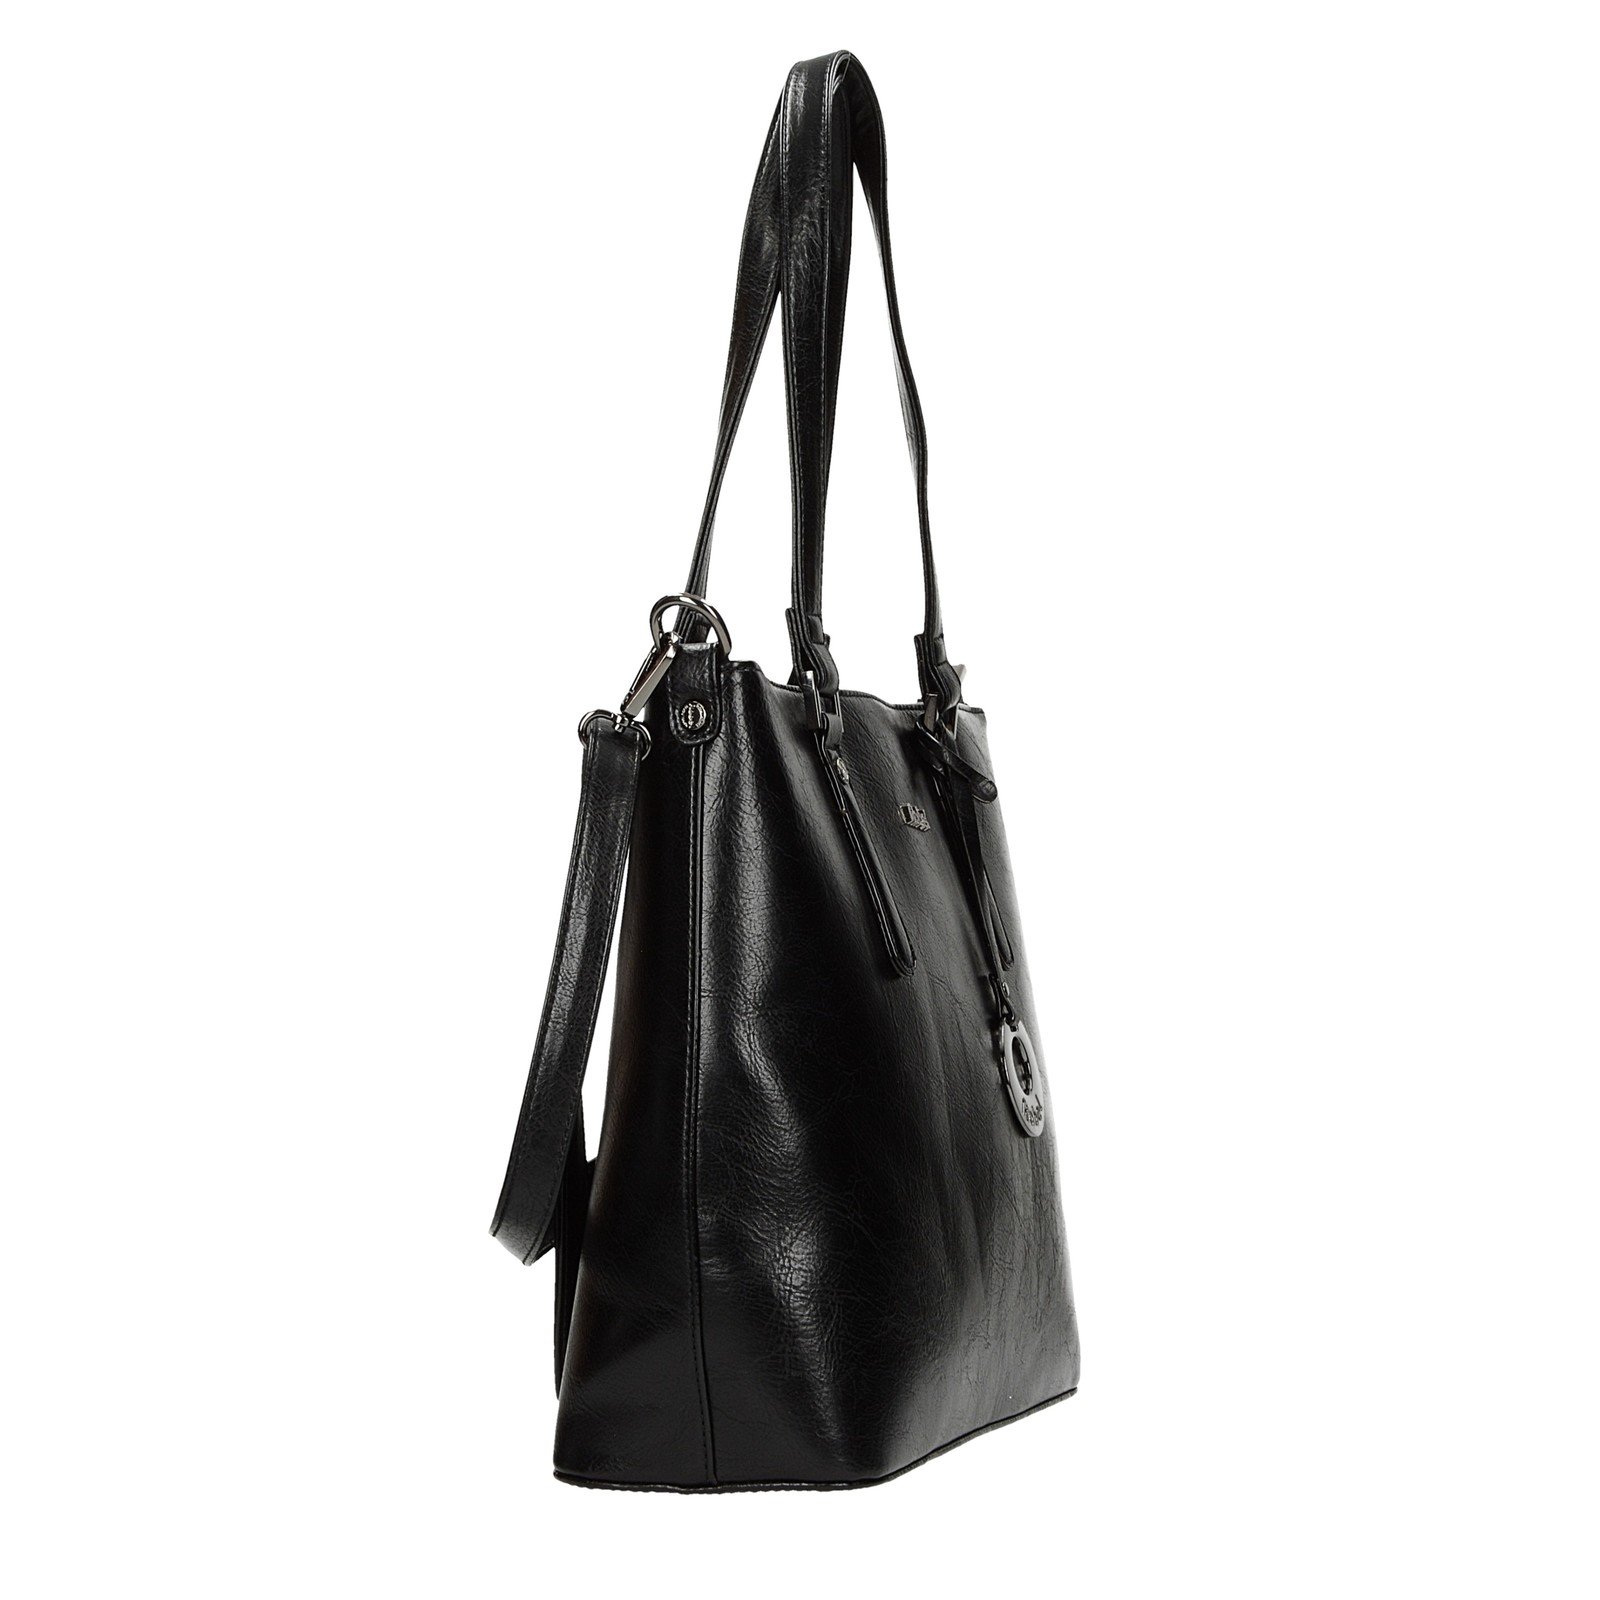 4318d61f0 Robel dámska elegantná kabelka - čierna | 3478-BLK www.robel.sk